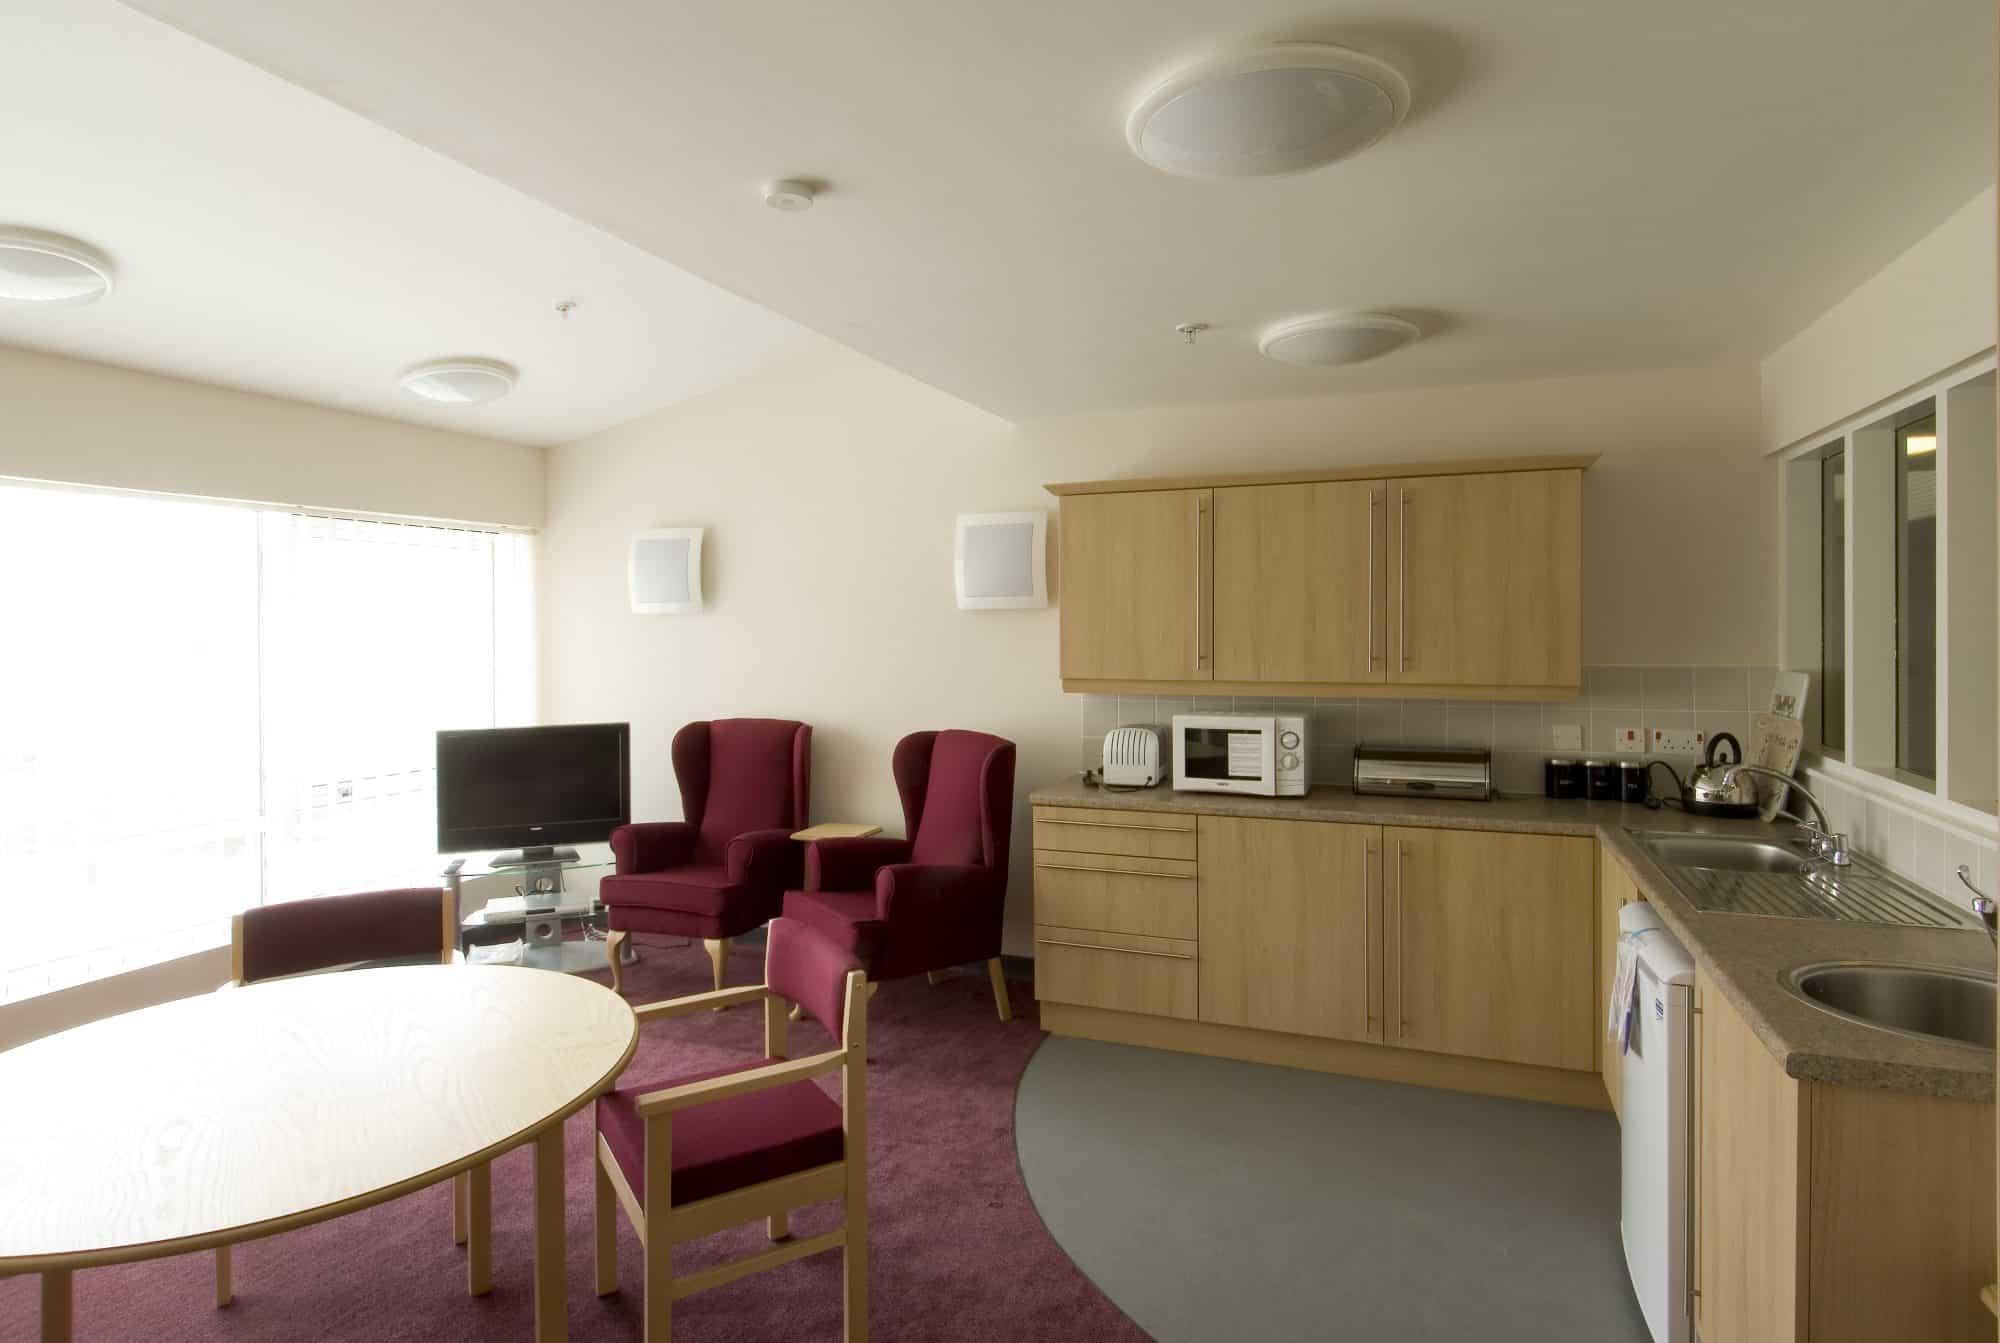 Broadmeadow Care Home Lee Evans Partnership